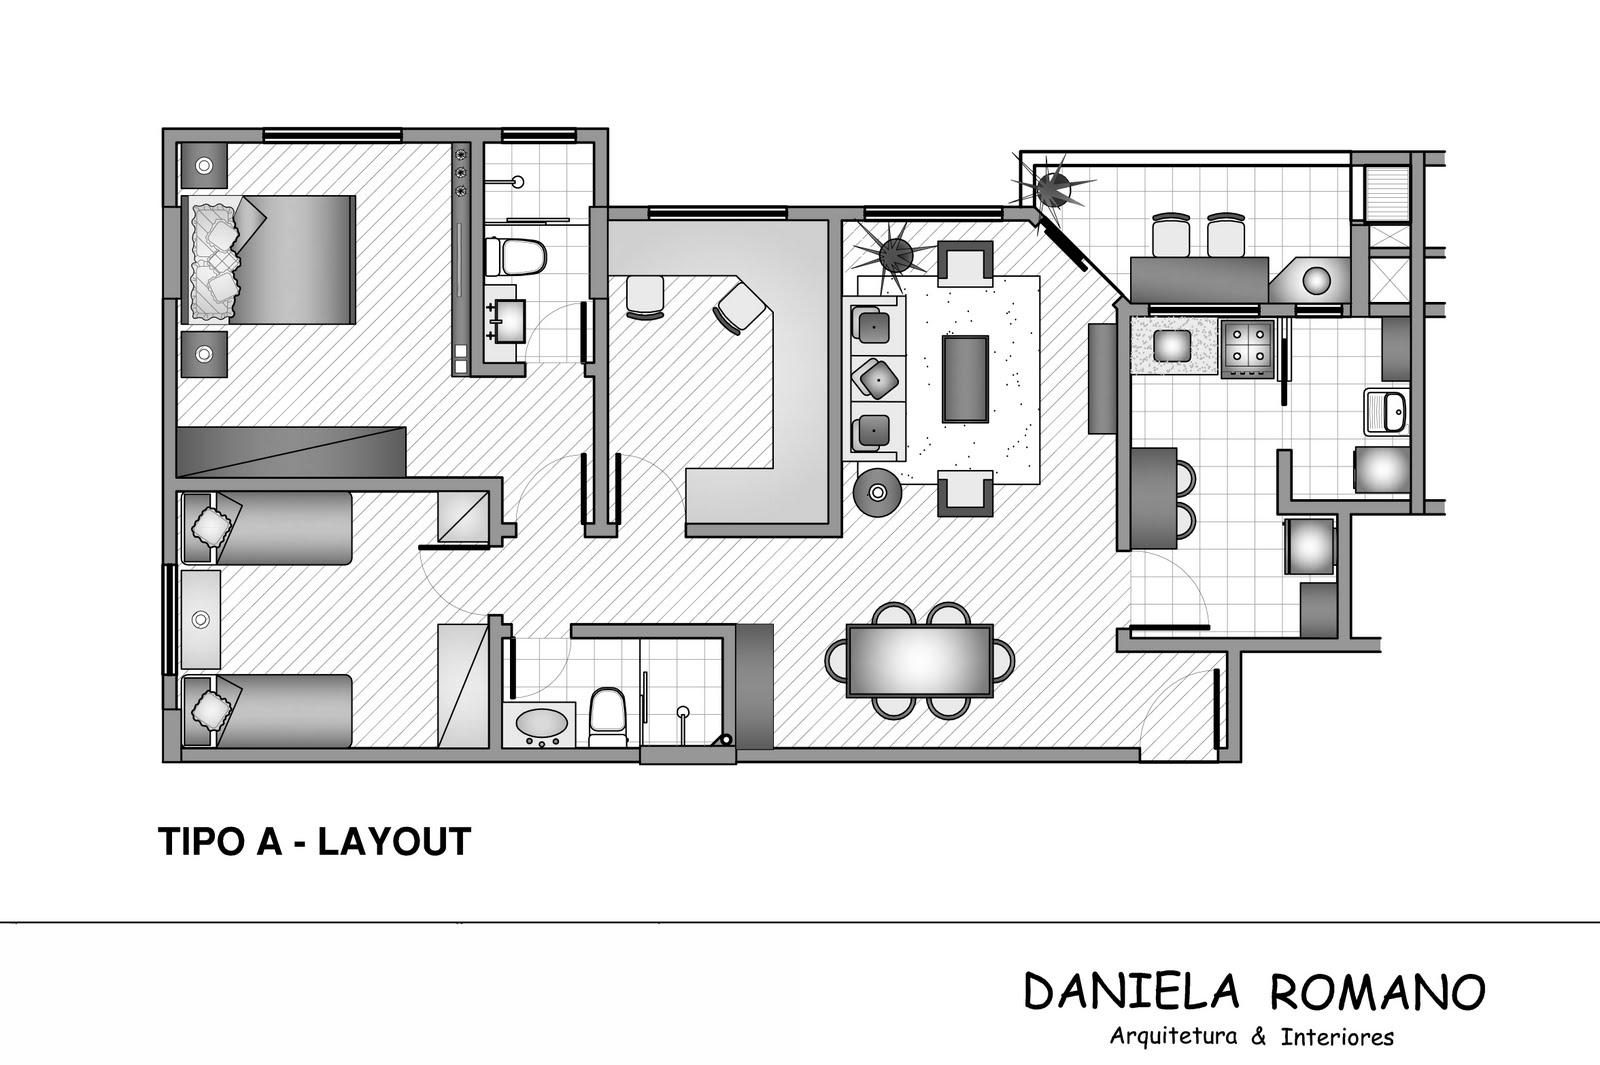 MARIANA PROJETISTA: Portifólio #08: DANIELA ROMANO #3B3B3B 1600 1065